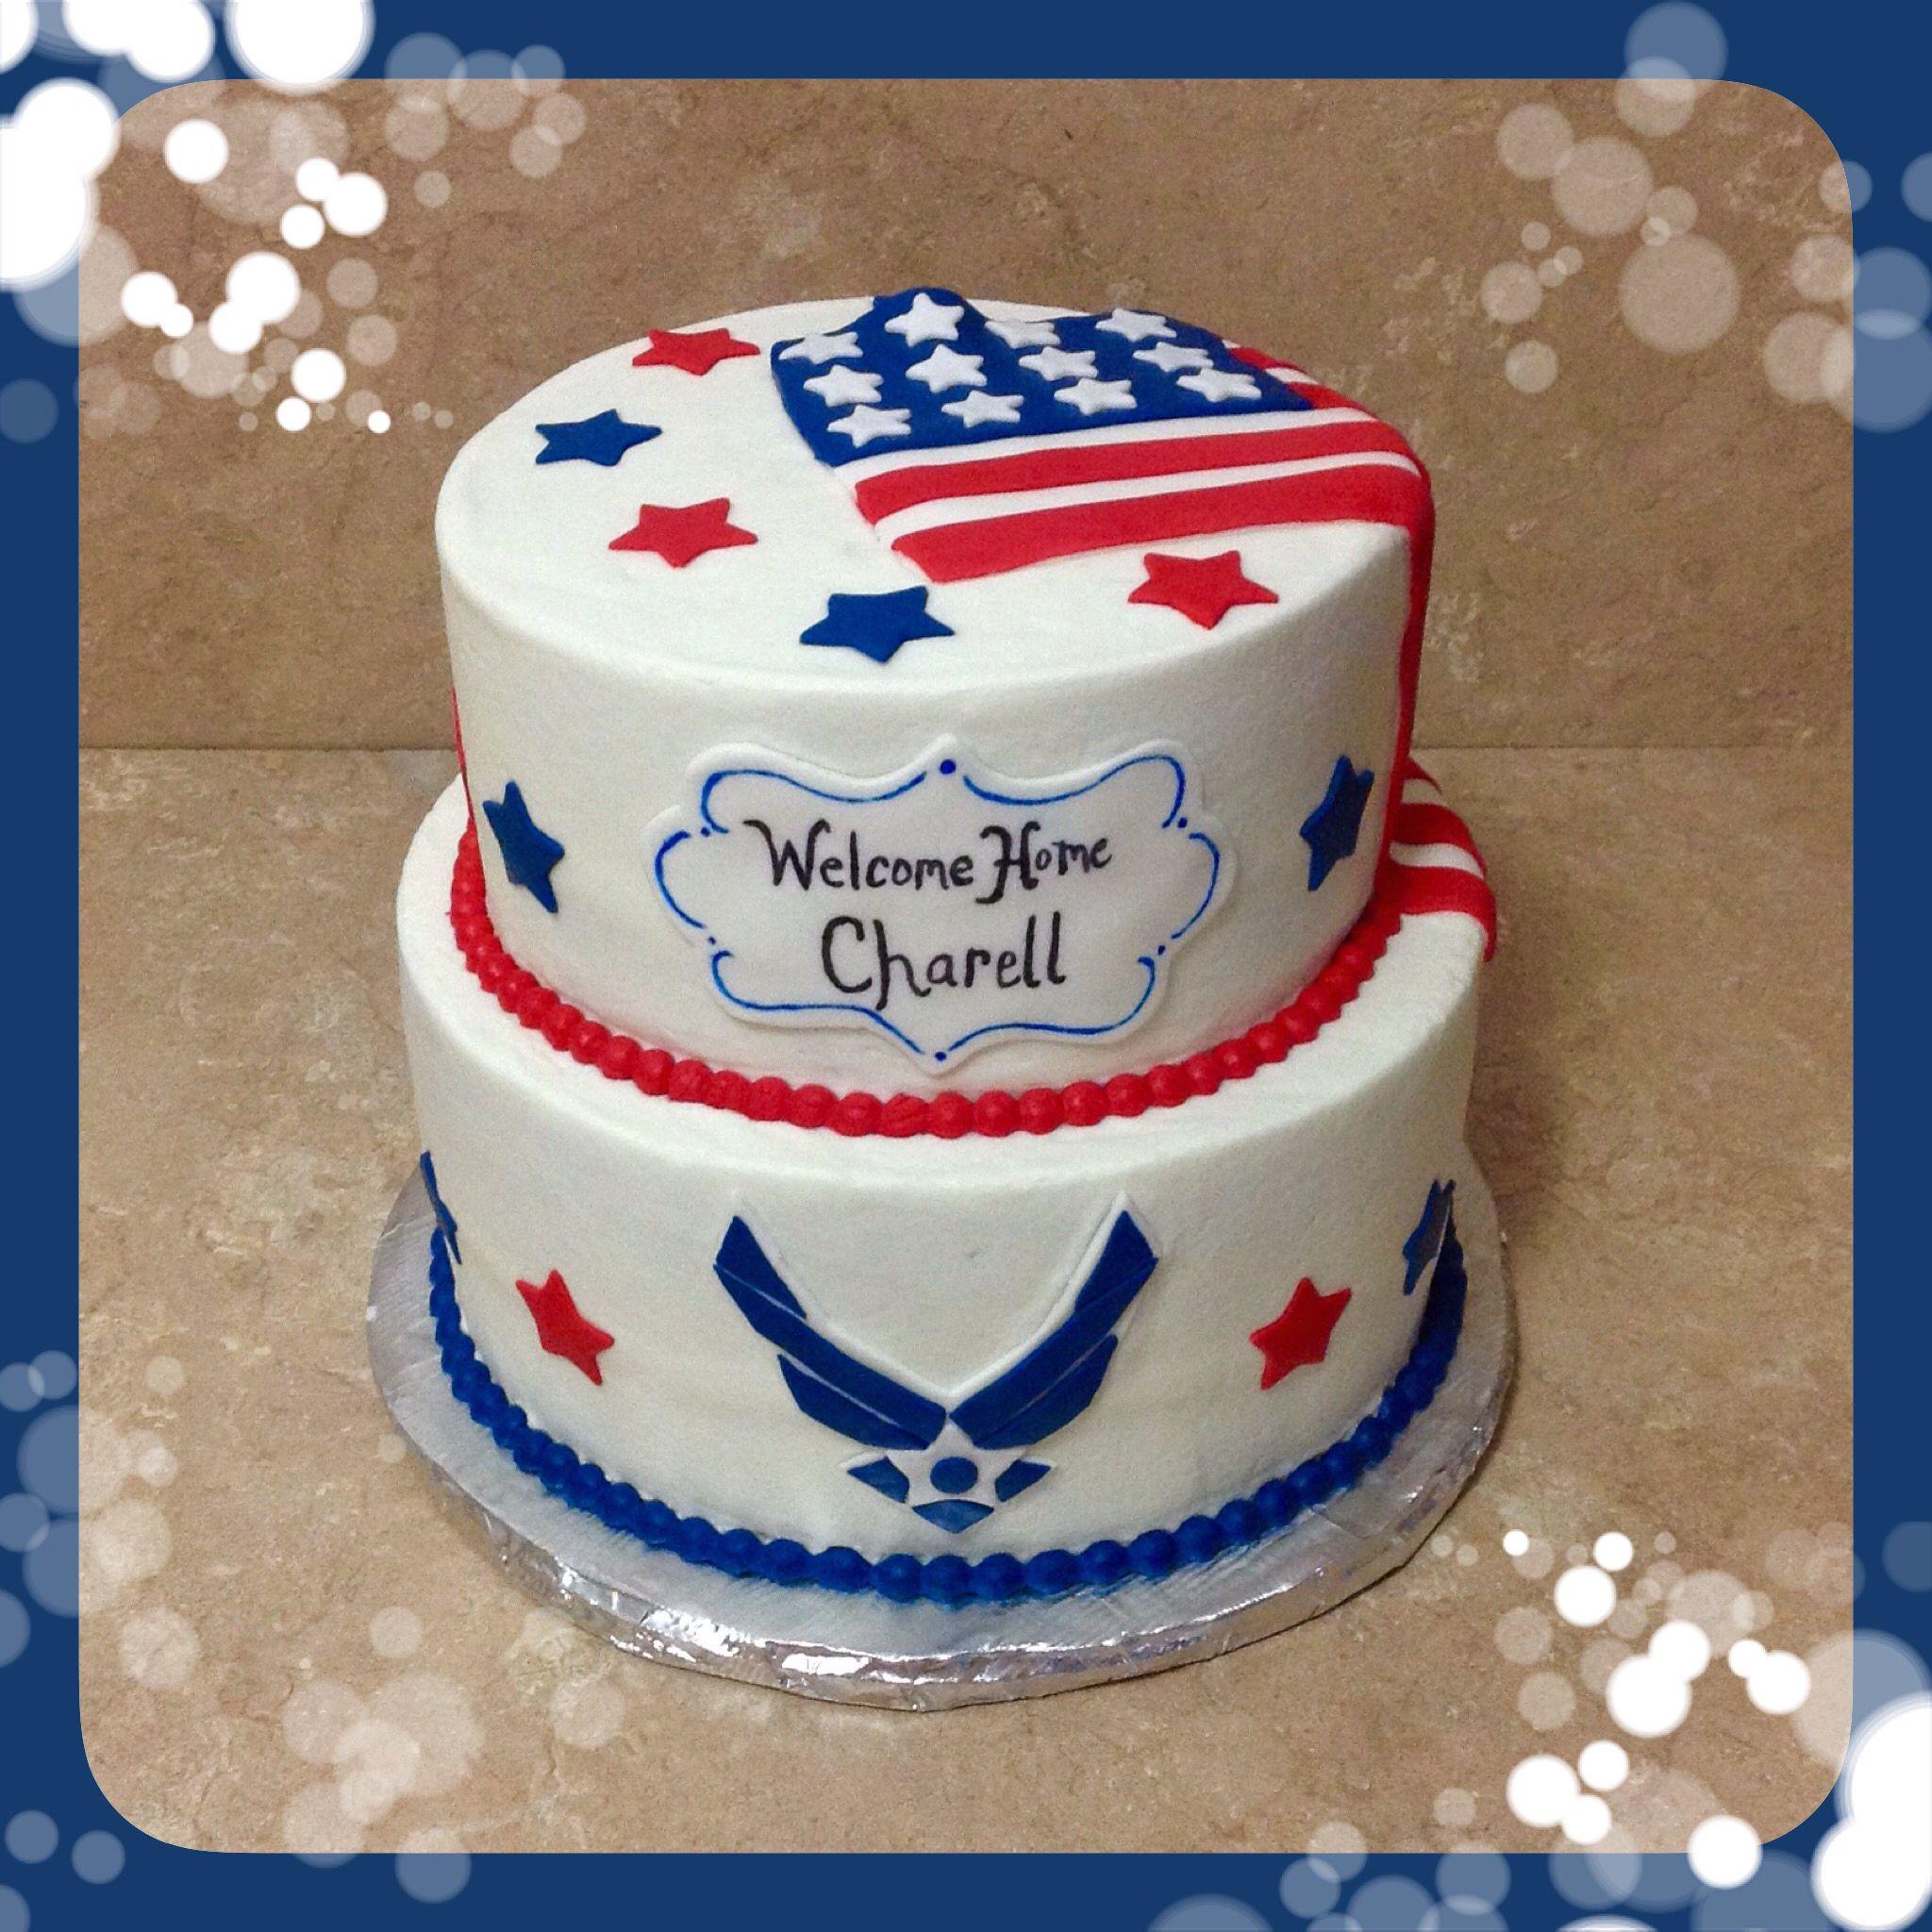 Air force home cake my cakes bbs creative